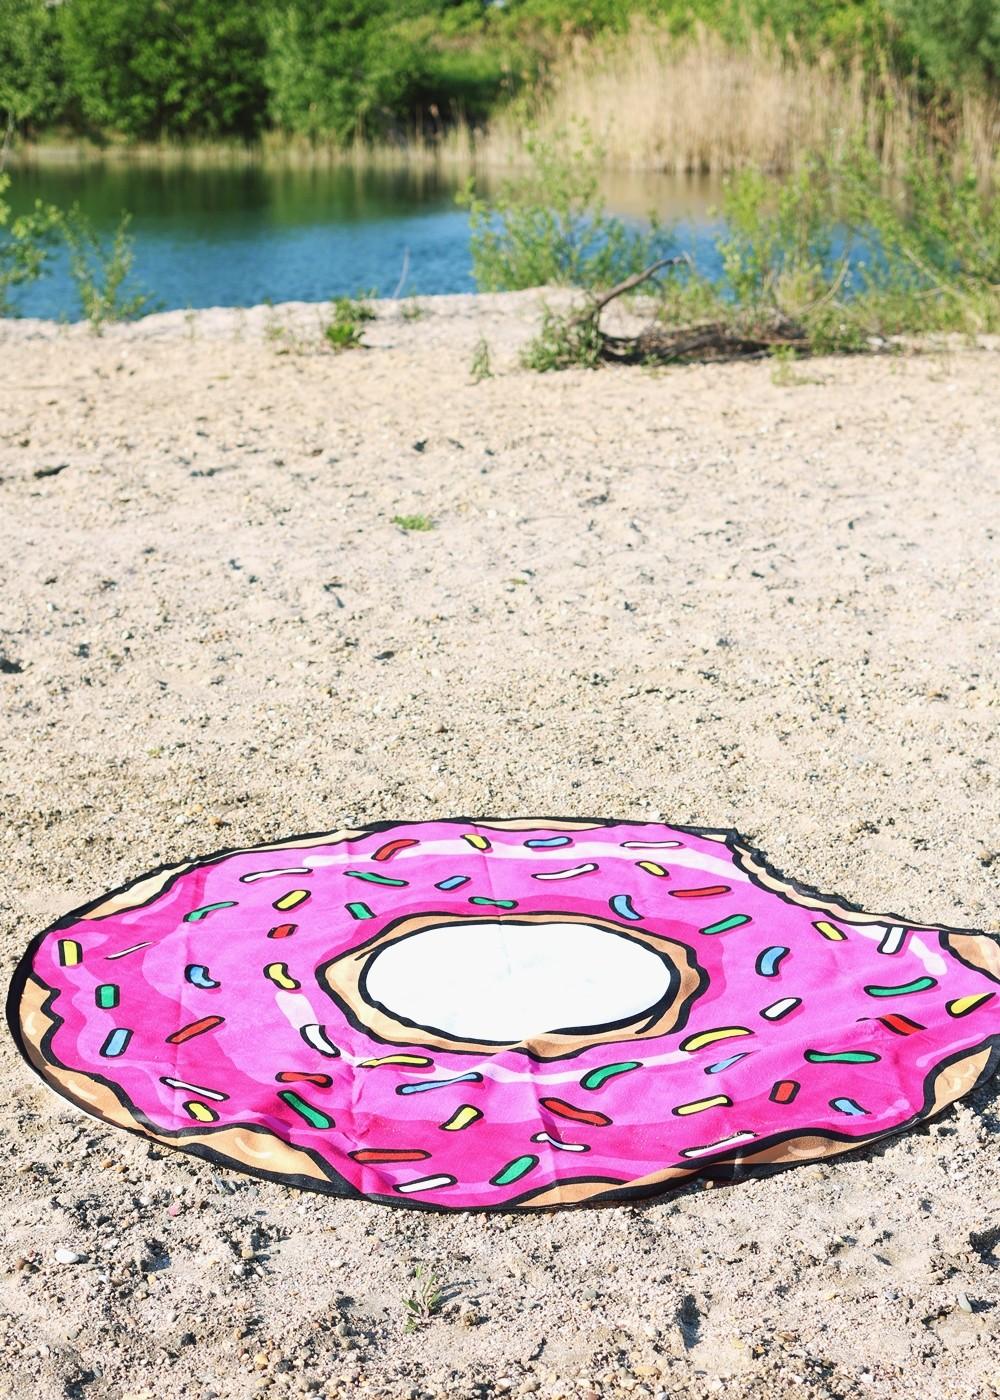 Flamingoschwimmring Donutstrandtuch Accessoires See Strand Radbag (8)